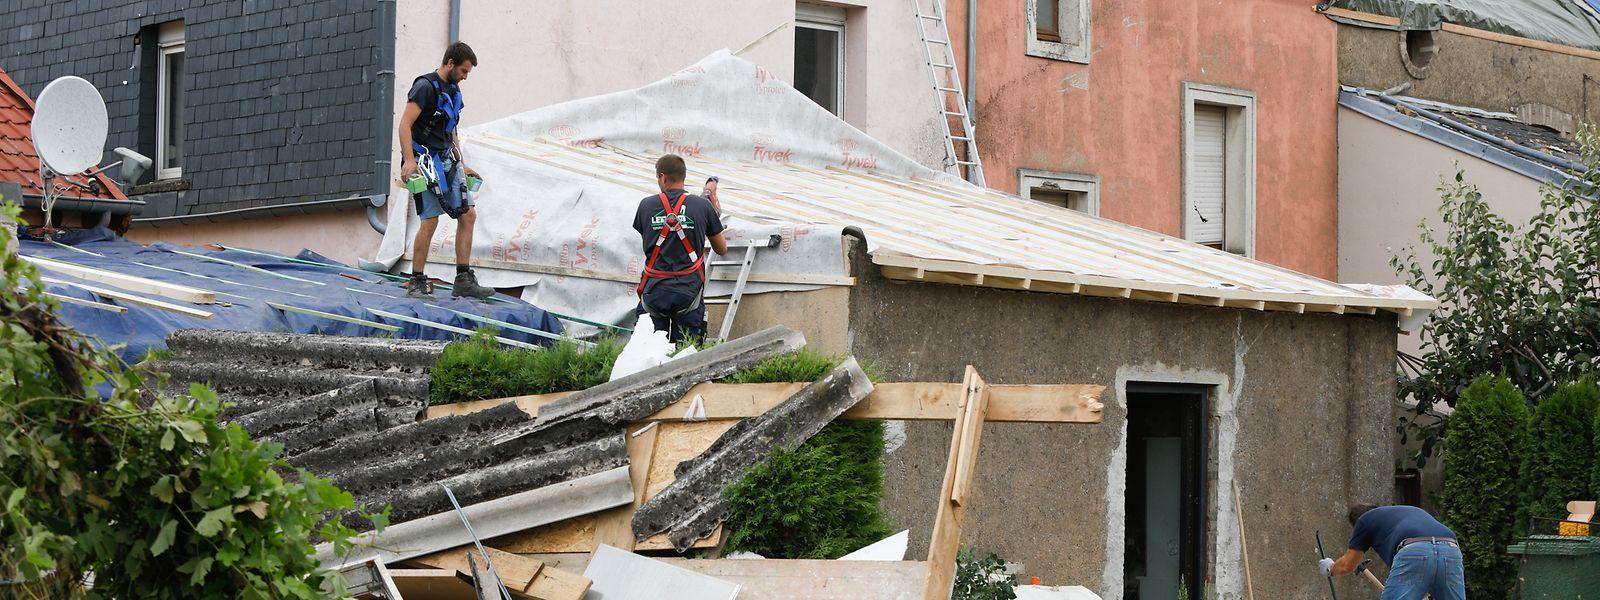 Schäden in der Rue Neuve in Petingen.